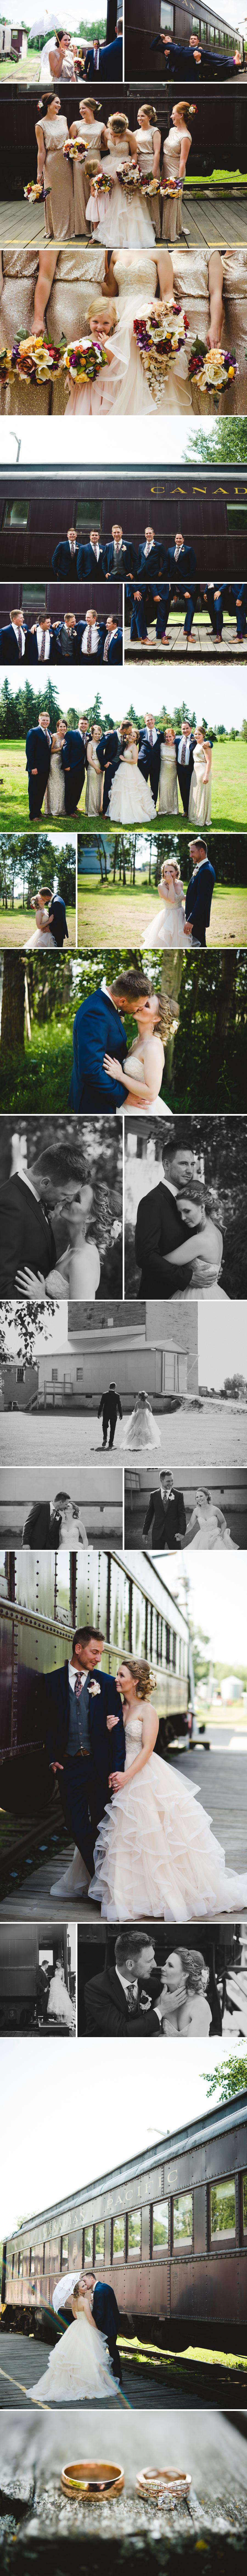 bbcollective_yeg_blog_2017_jessicaandthomas_wedding_photographycomp002.jpg